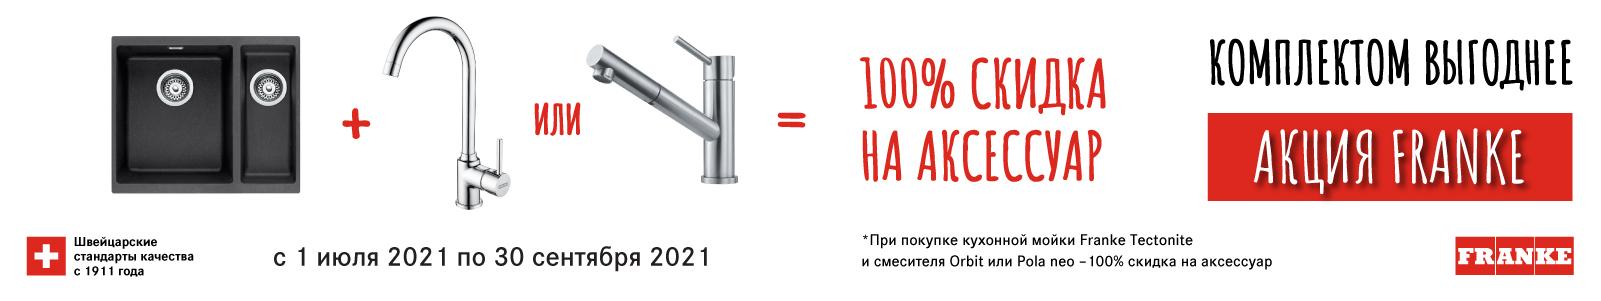 akcijakomplektomvygodnee_1600x300